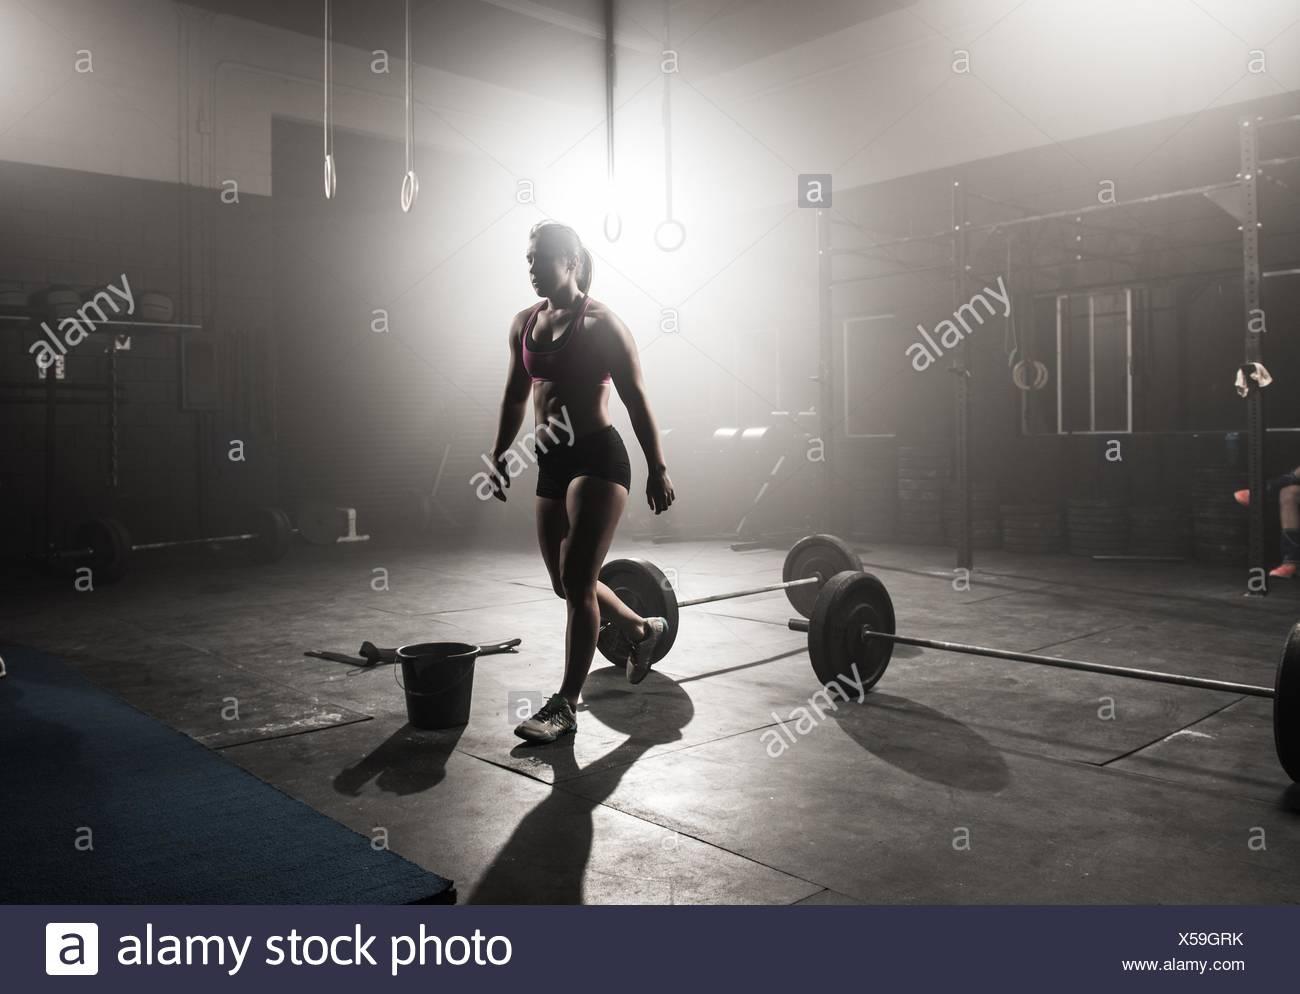 Joven que trabaja en el gimnasio Imagen De Stock